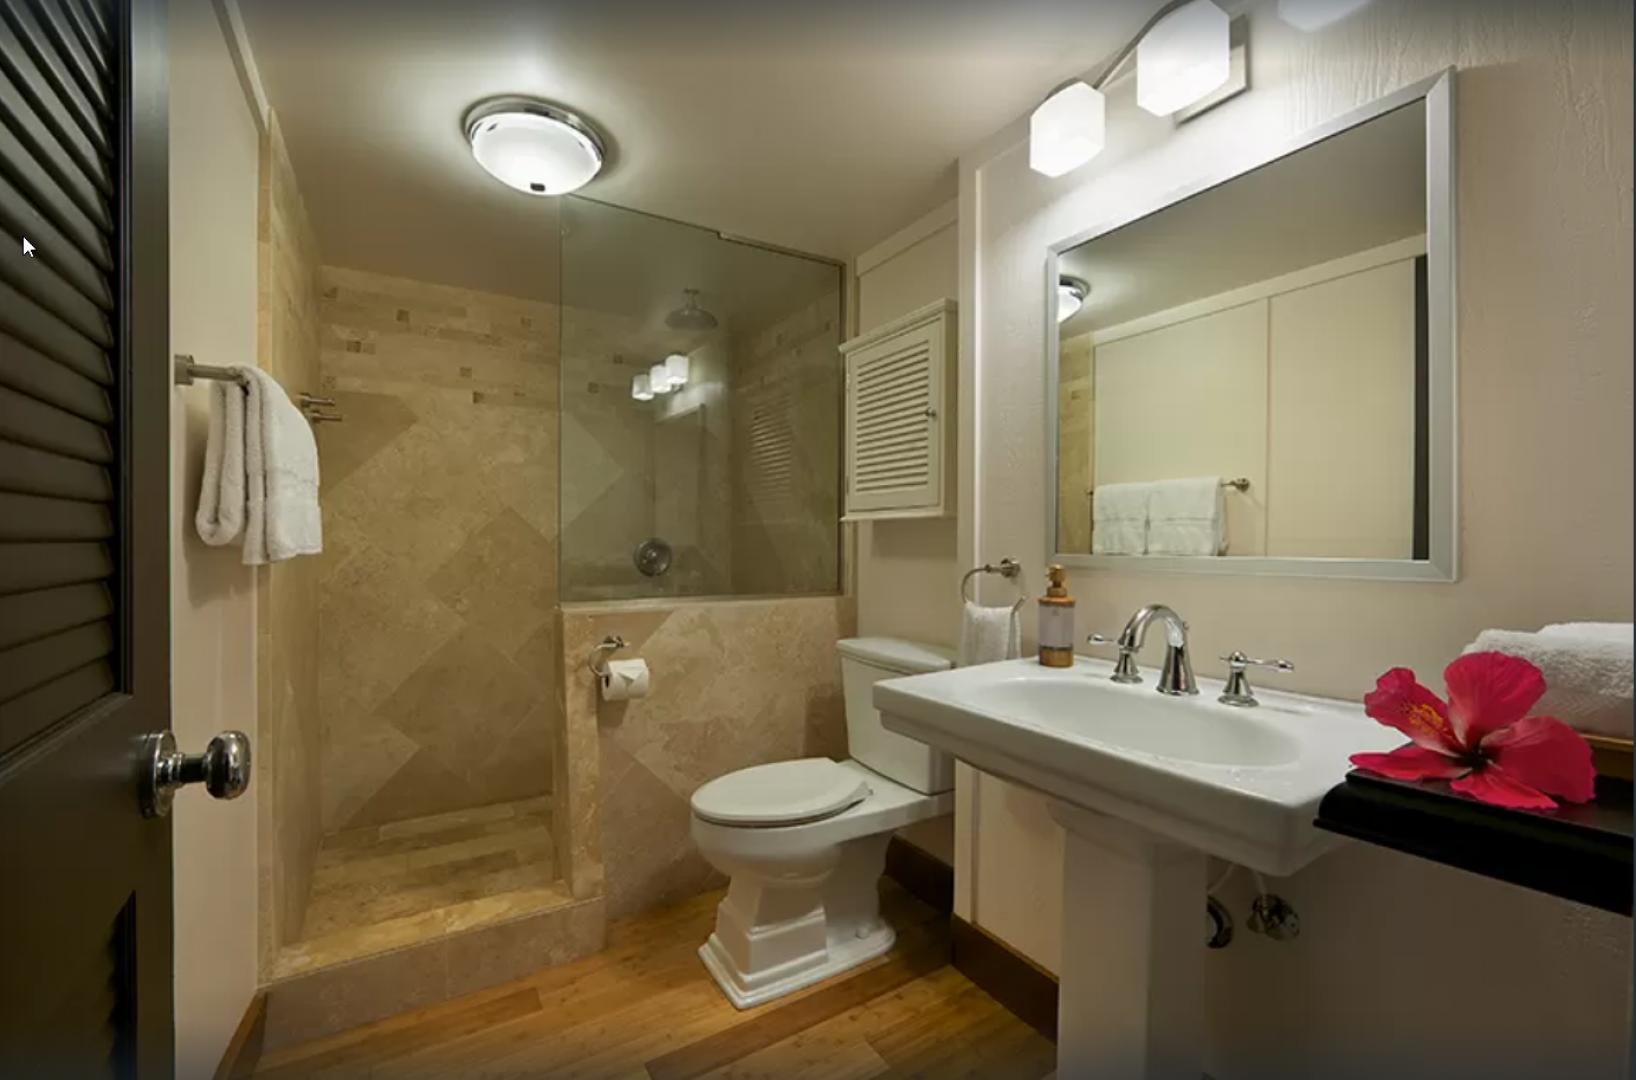 Downstairs main bathroom